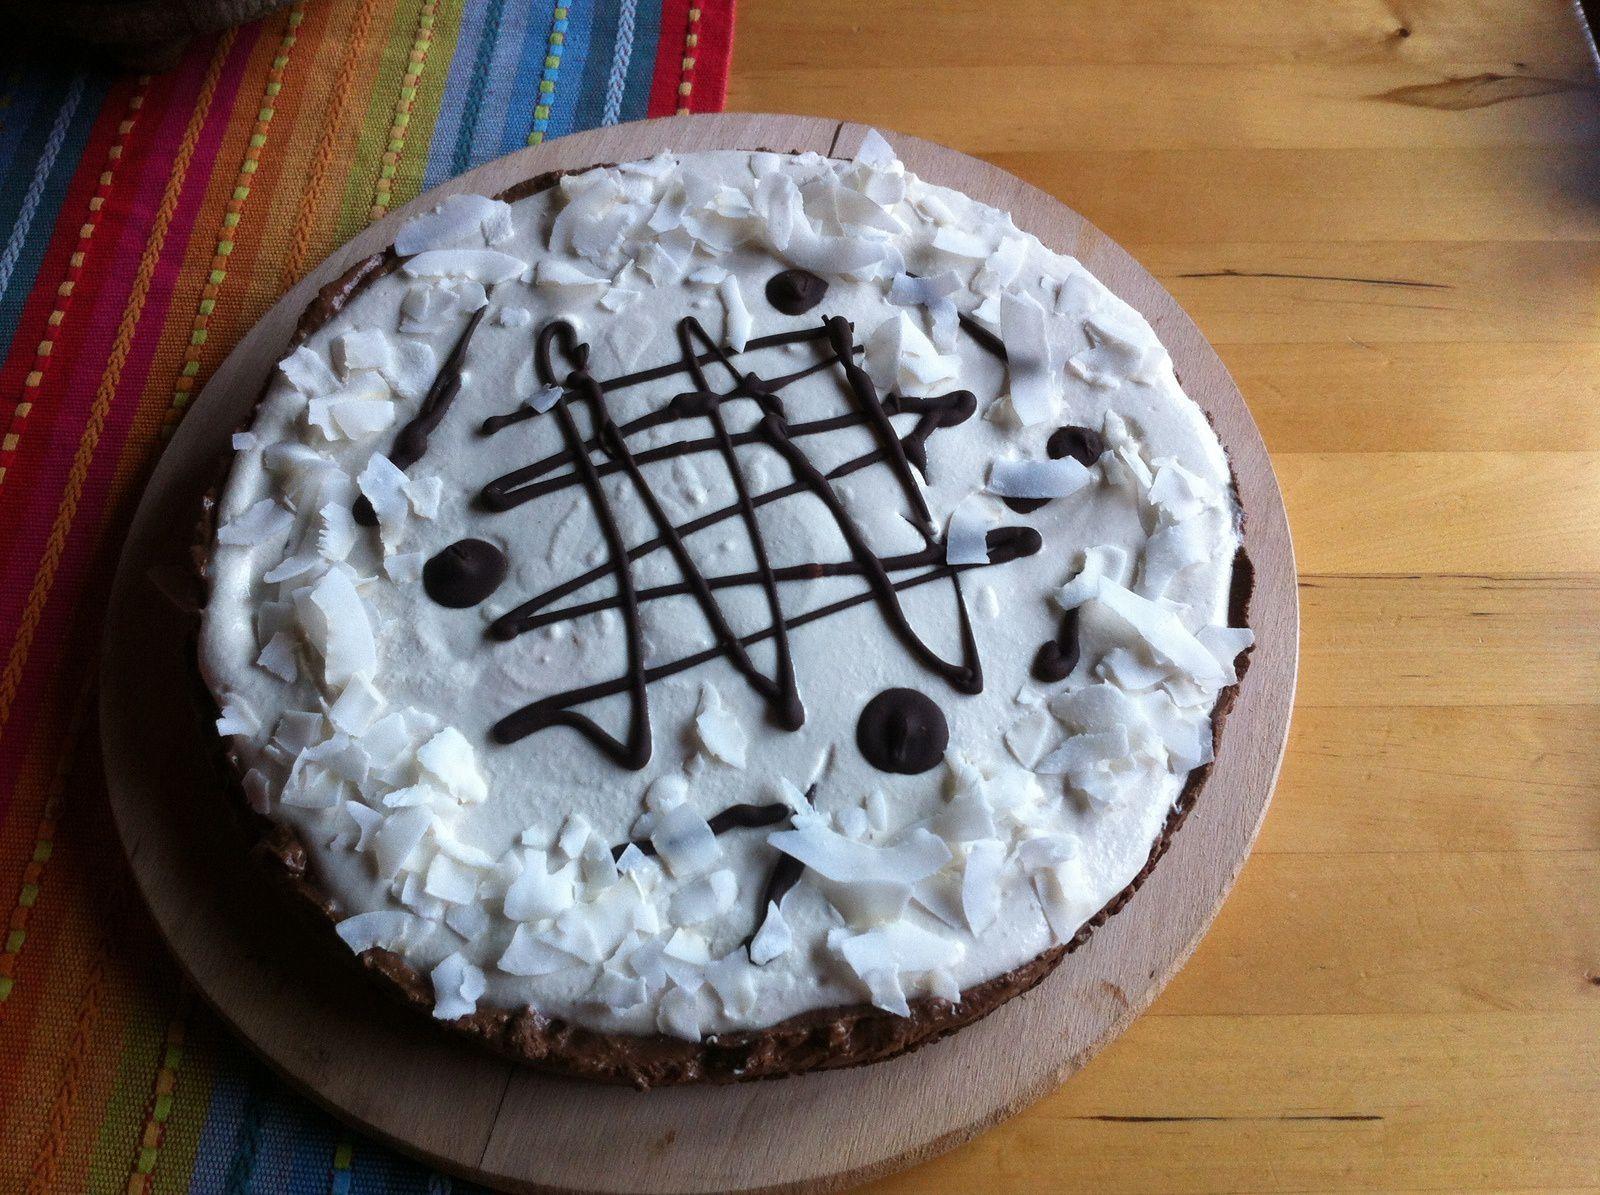 Gâteau Choco-coco-paleo-vegan etc.